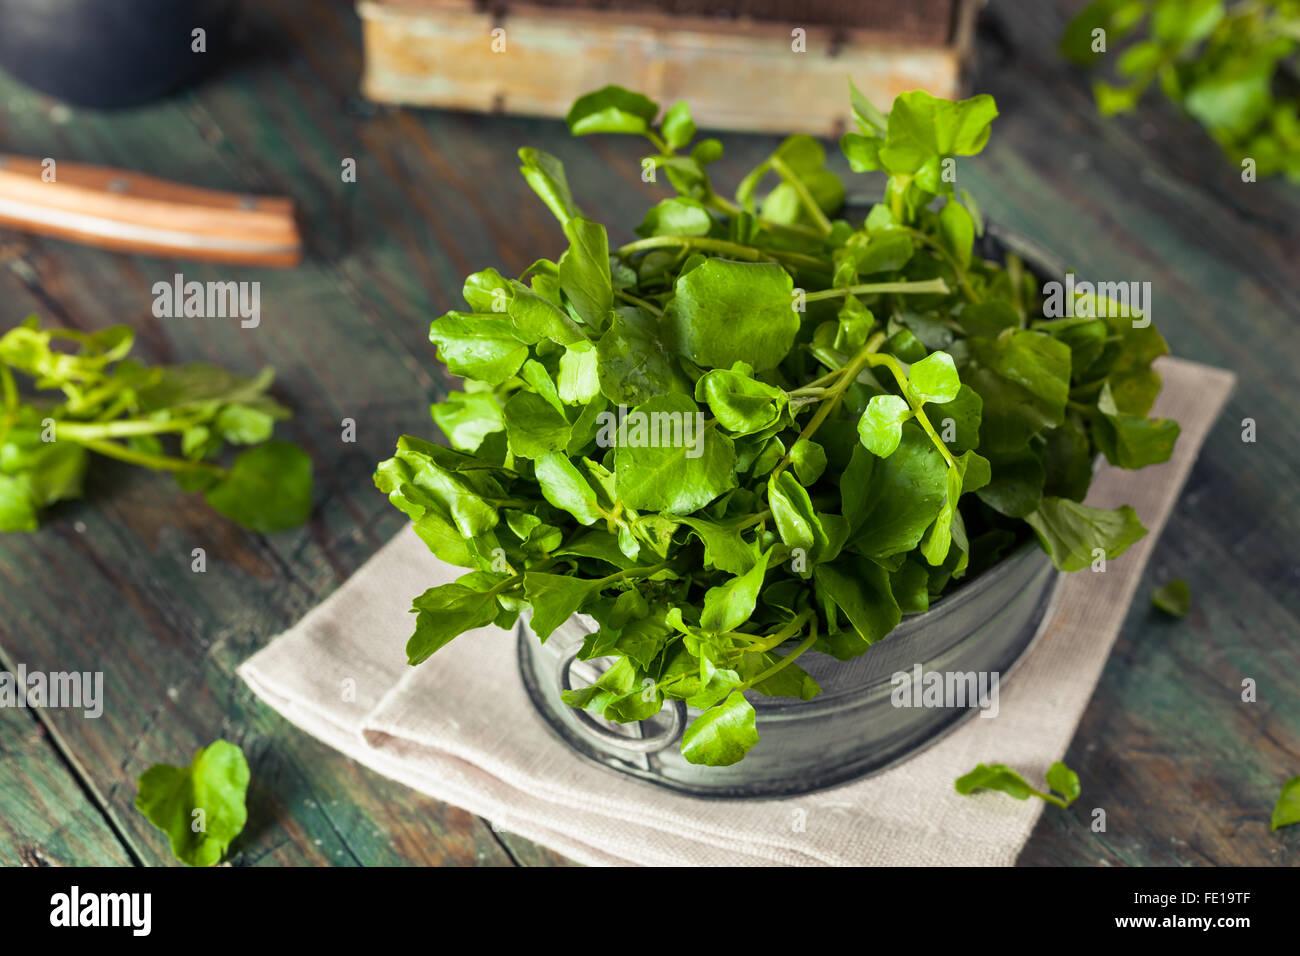 Raw Organic Green Watercress Ready to Use Stock Photo